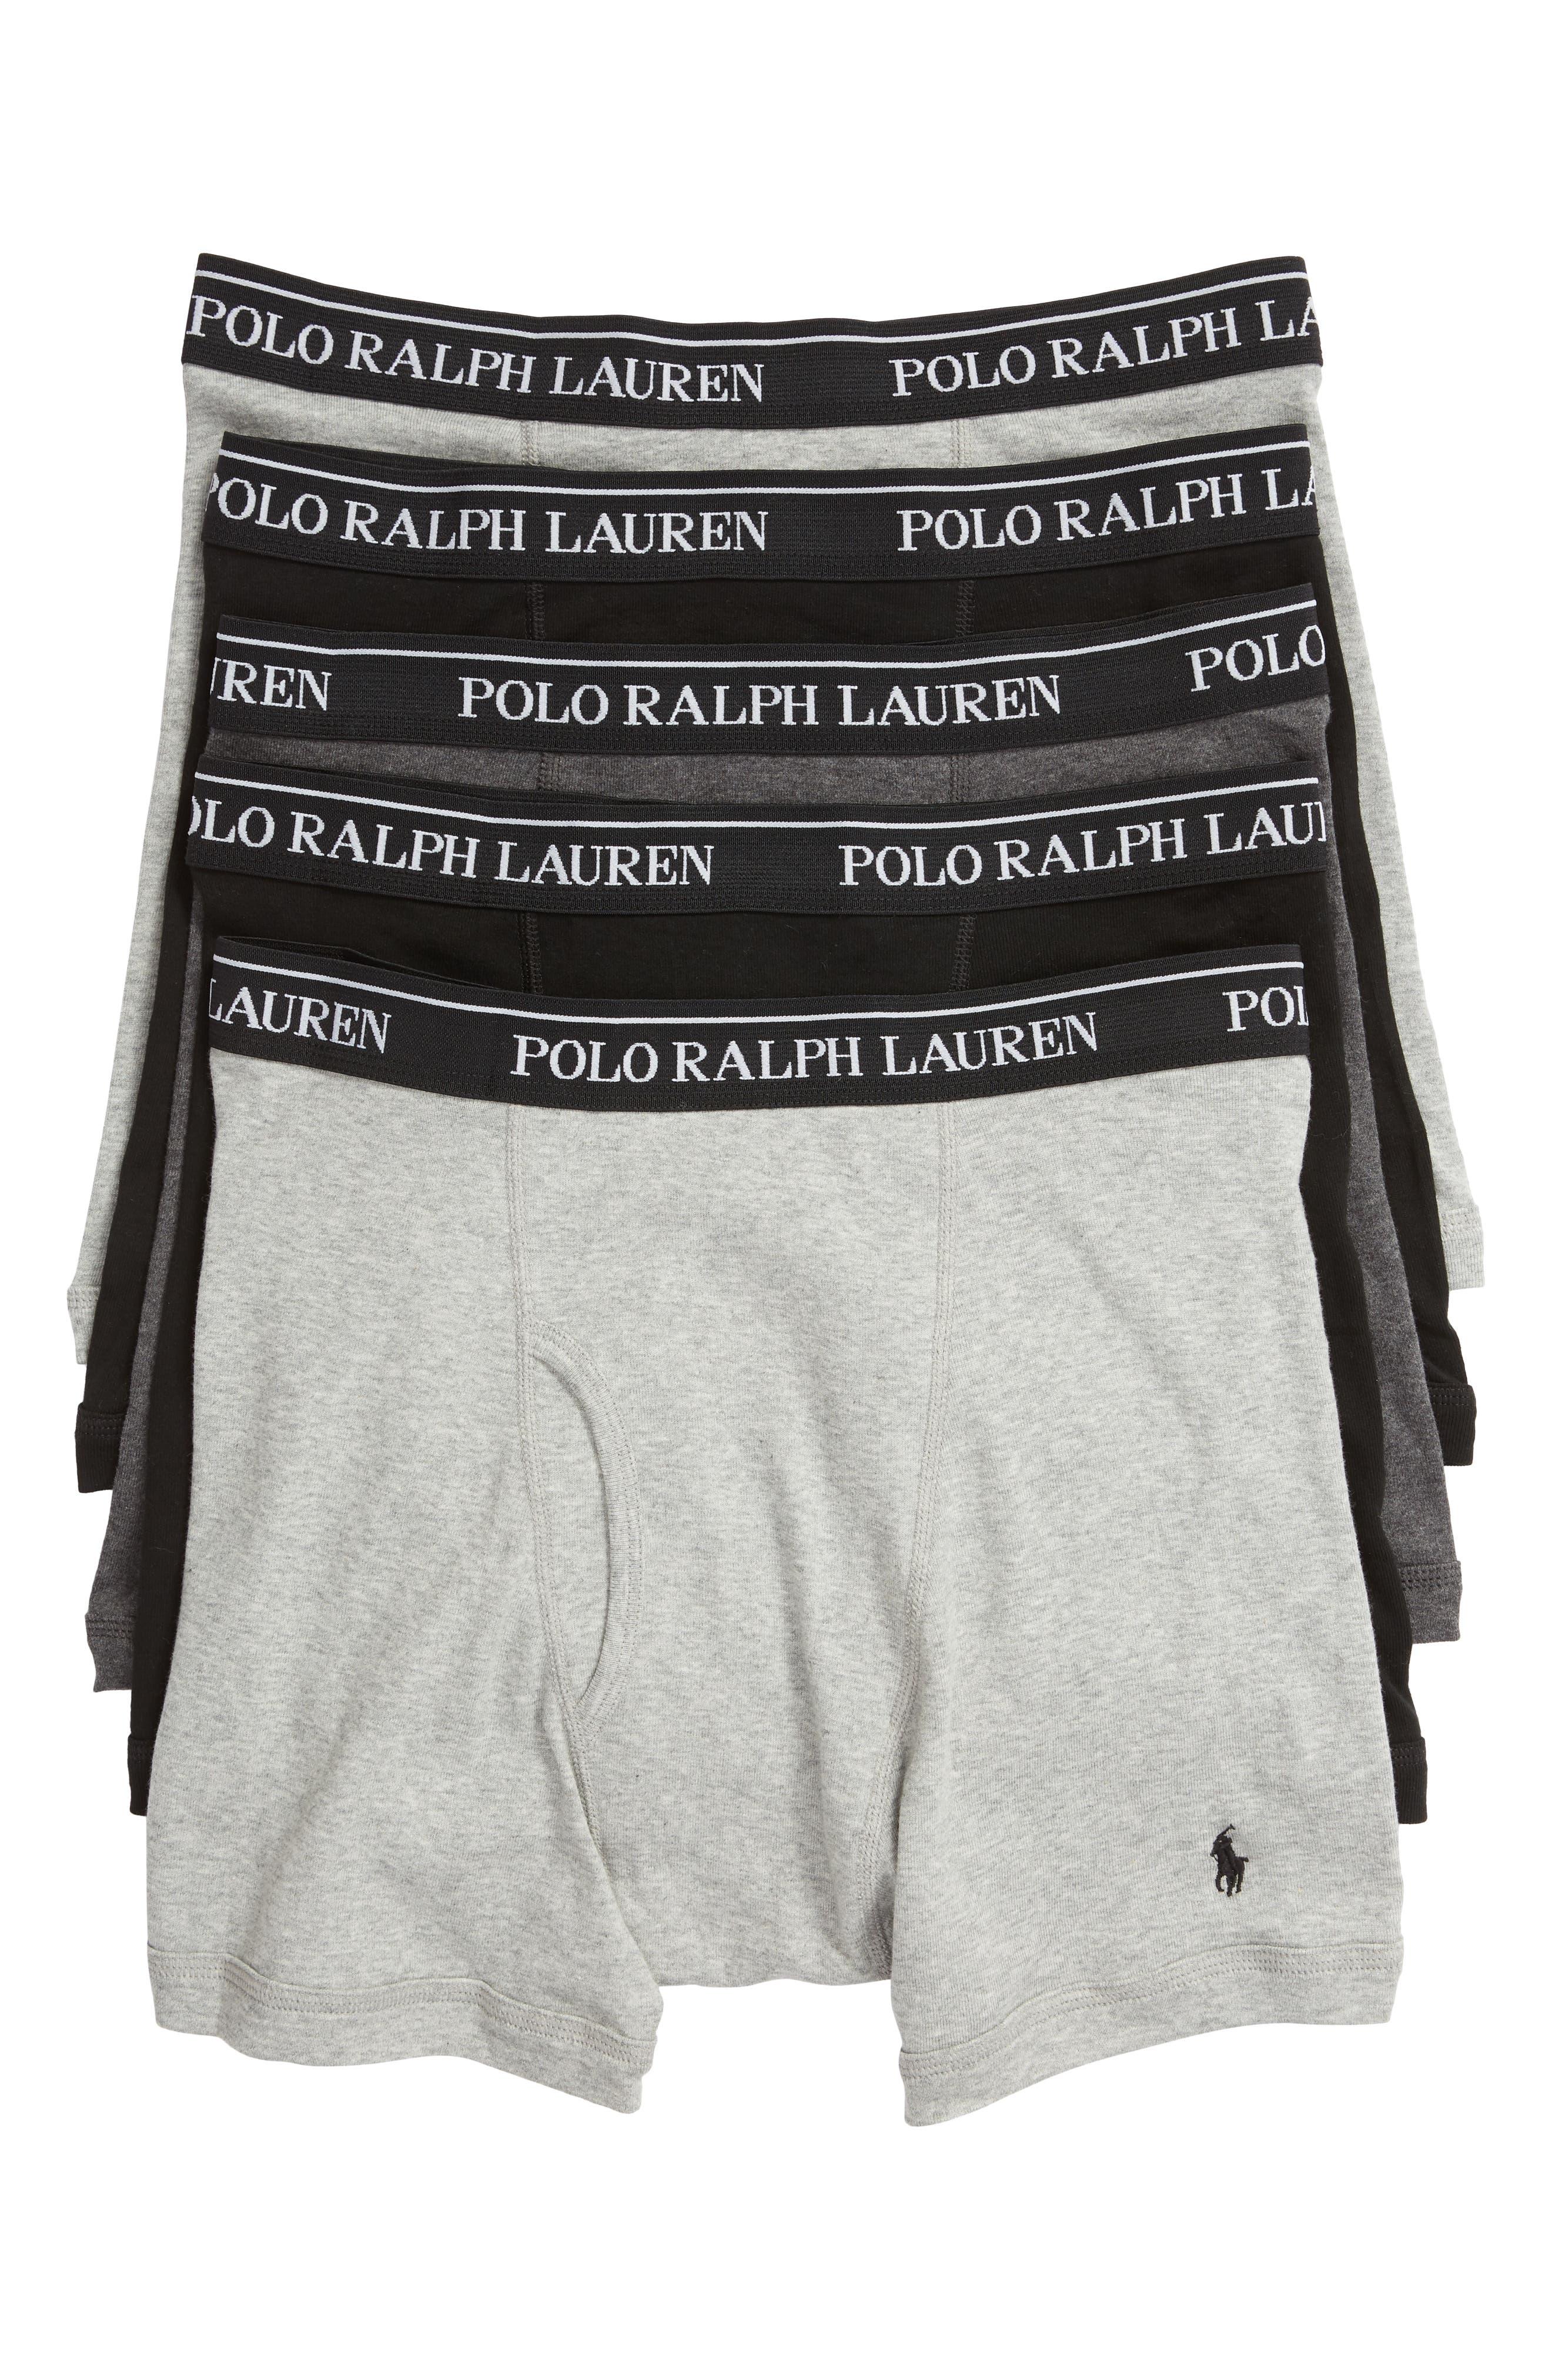 Polo Ralph Lauren 5-Pack Cotton Boxer Briefs,                             Main thumbnail 1, color,                             2ANDHTH/MA